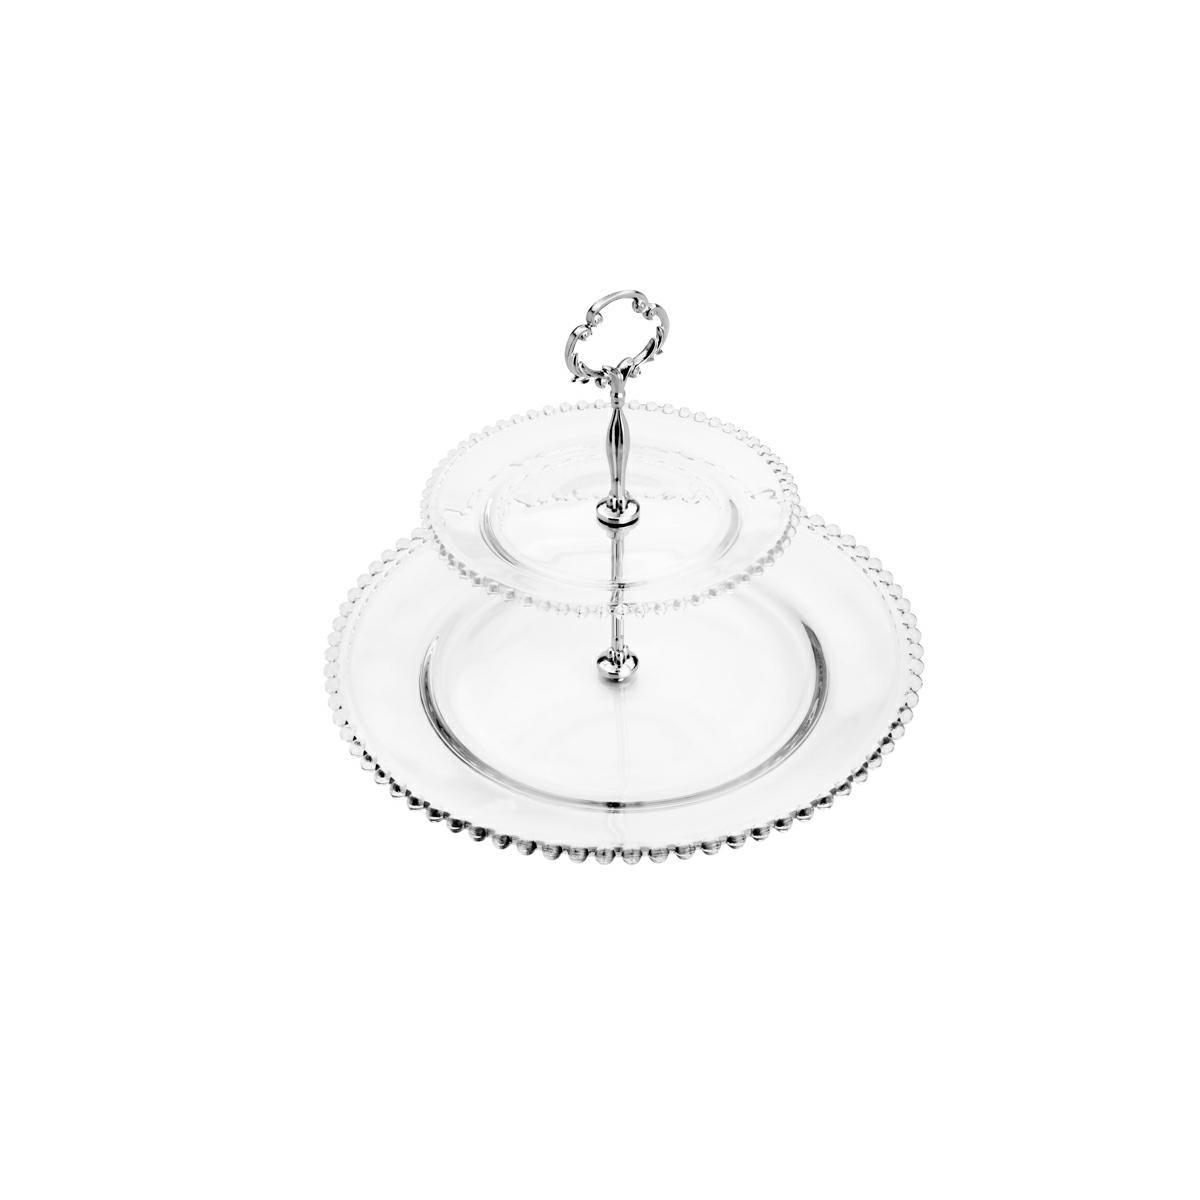 Prato duplo 32 cm para doces de cristal transparente com suporte de metal Pearl Wolff -  35212